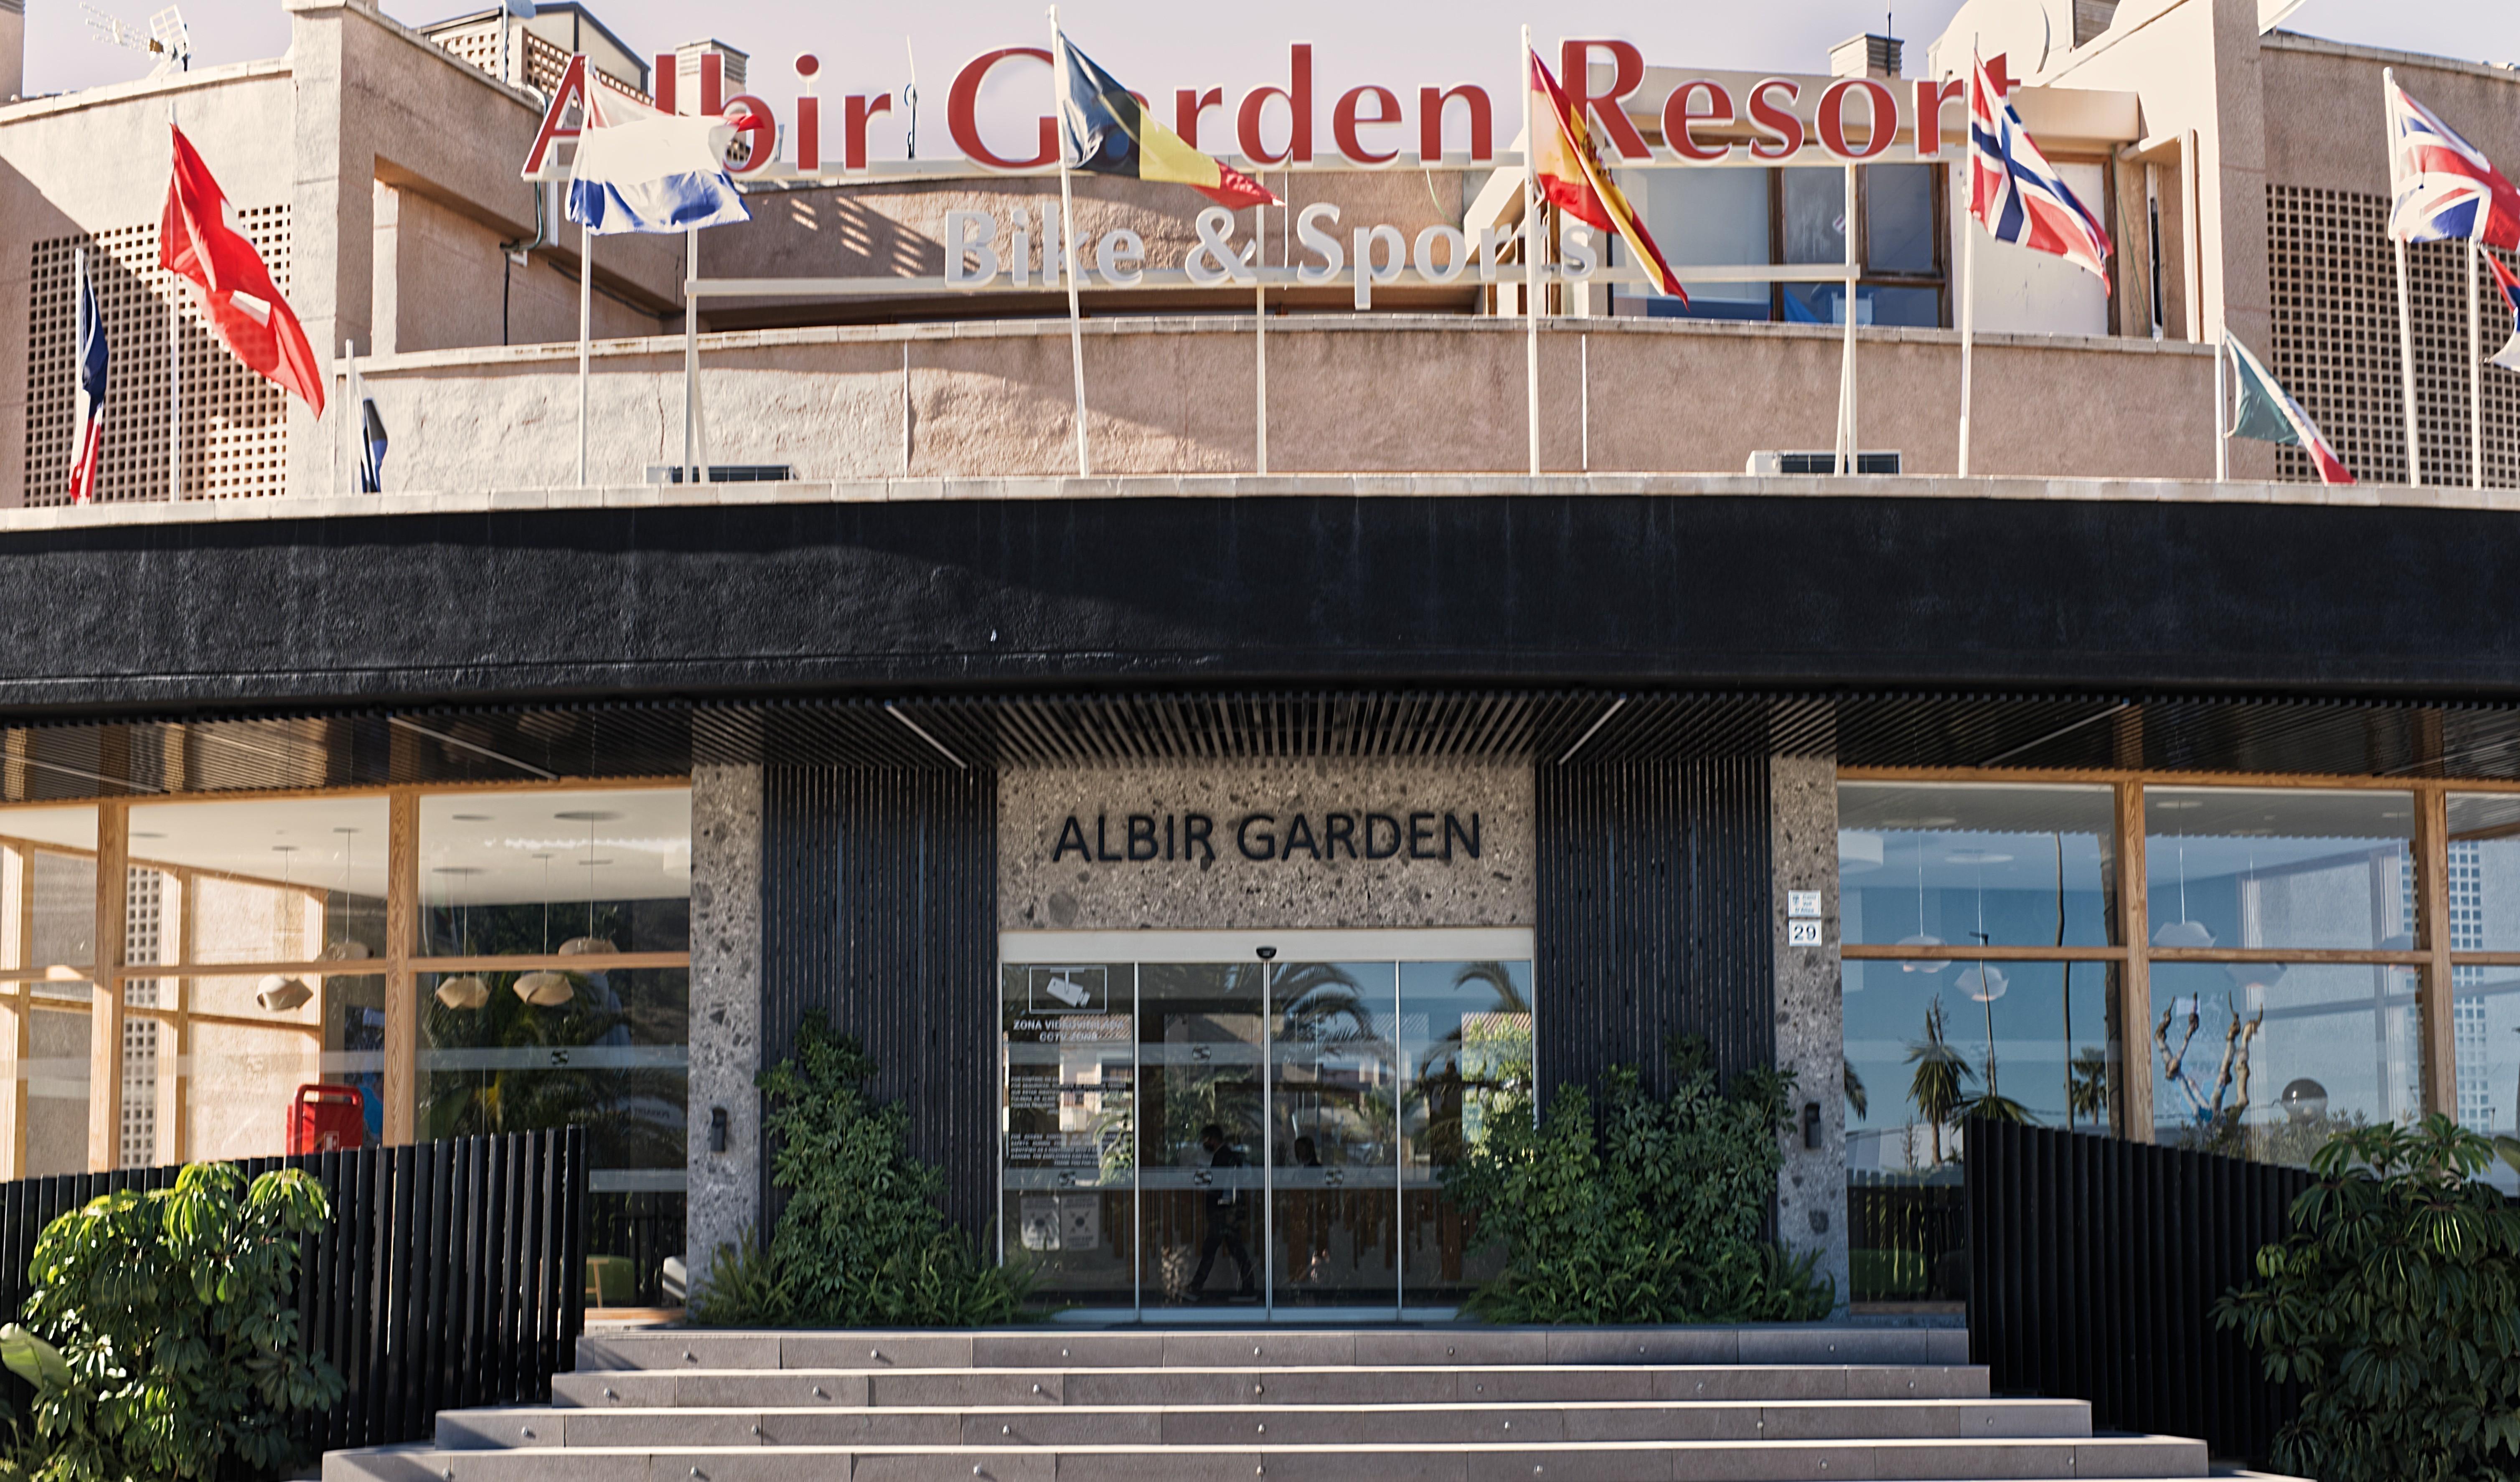 Albir  Garden  Resort & sports